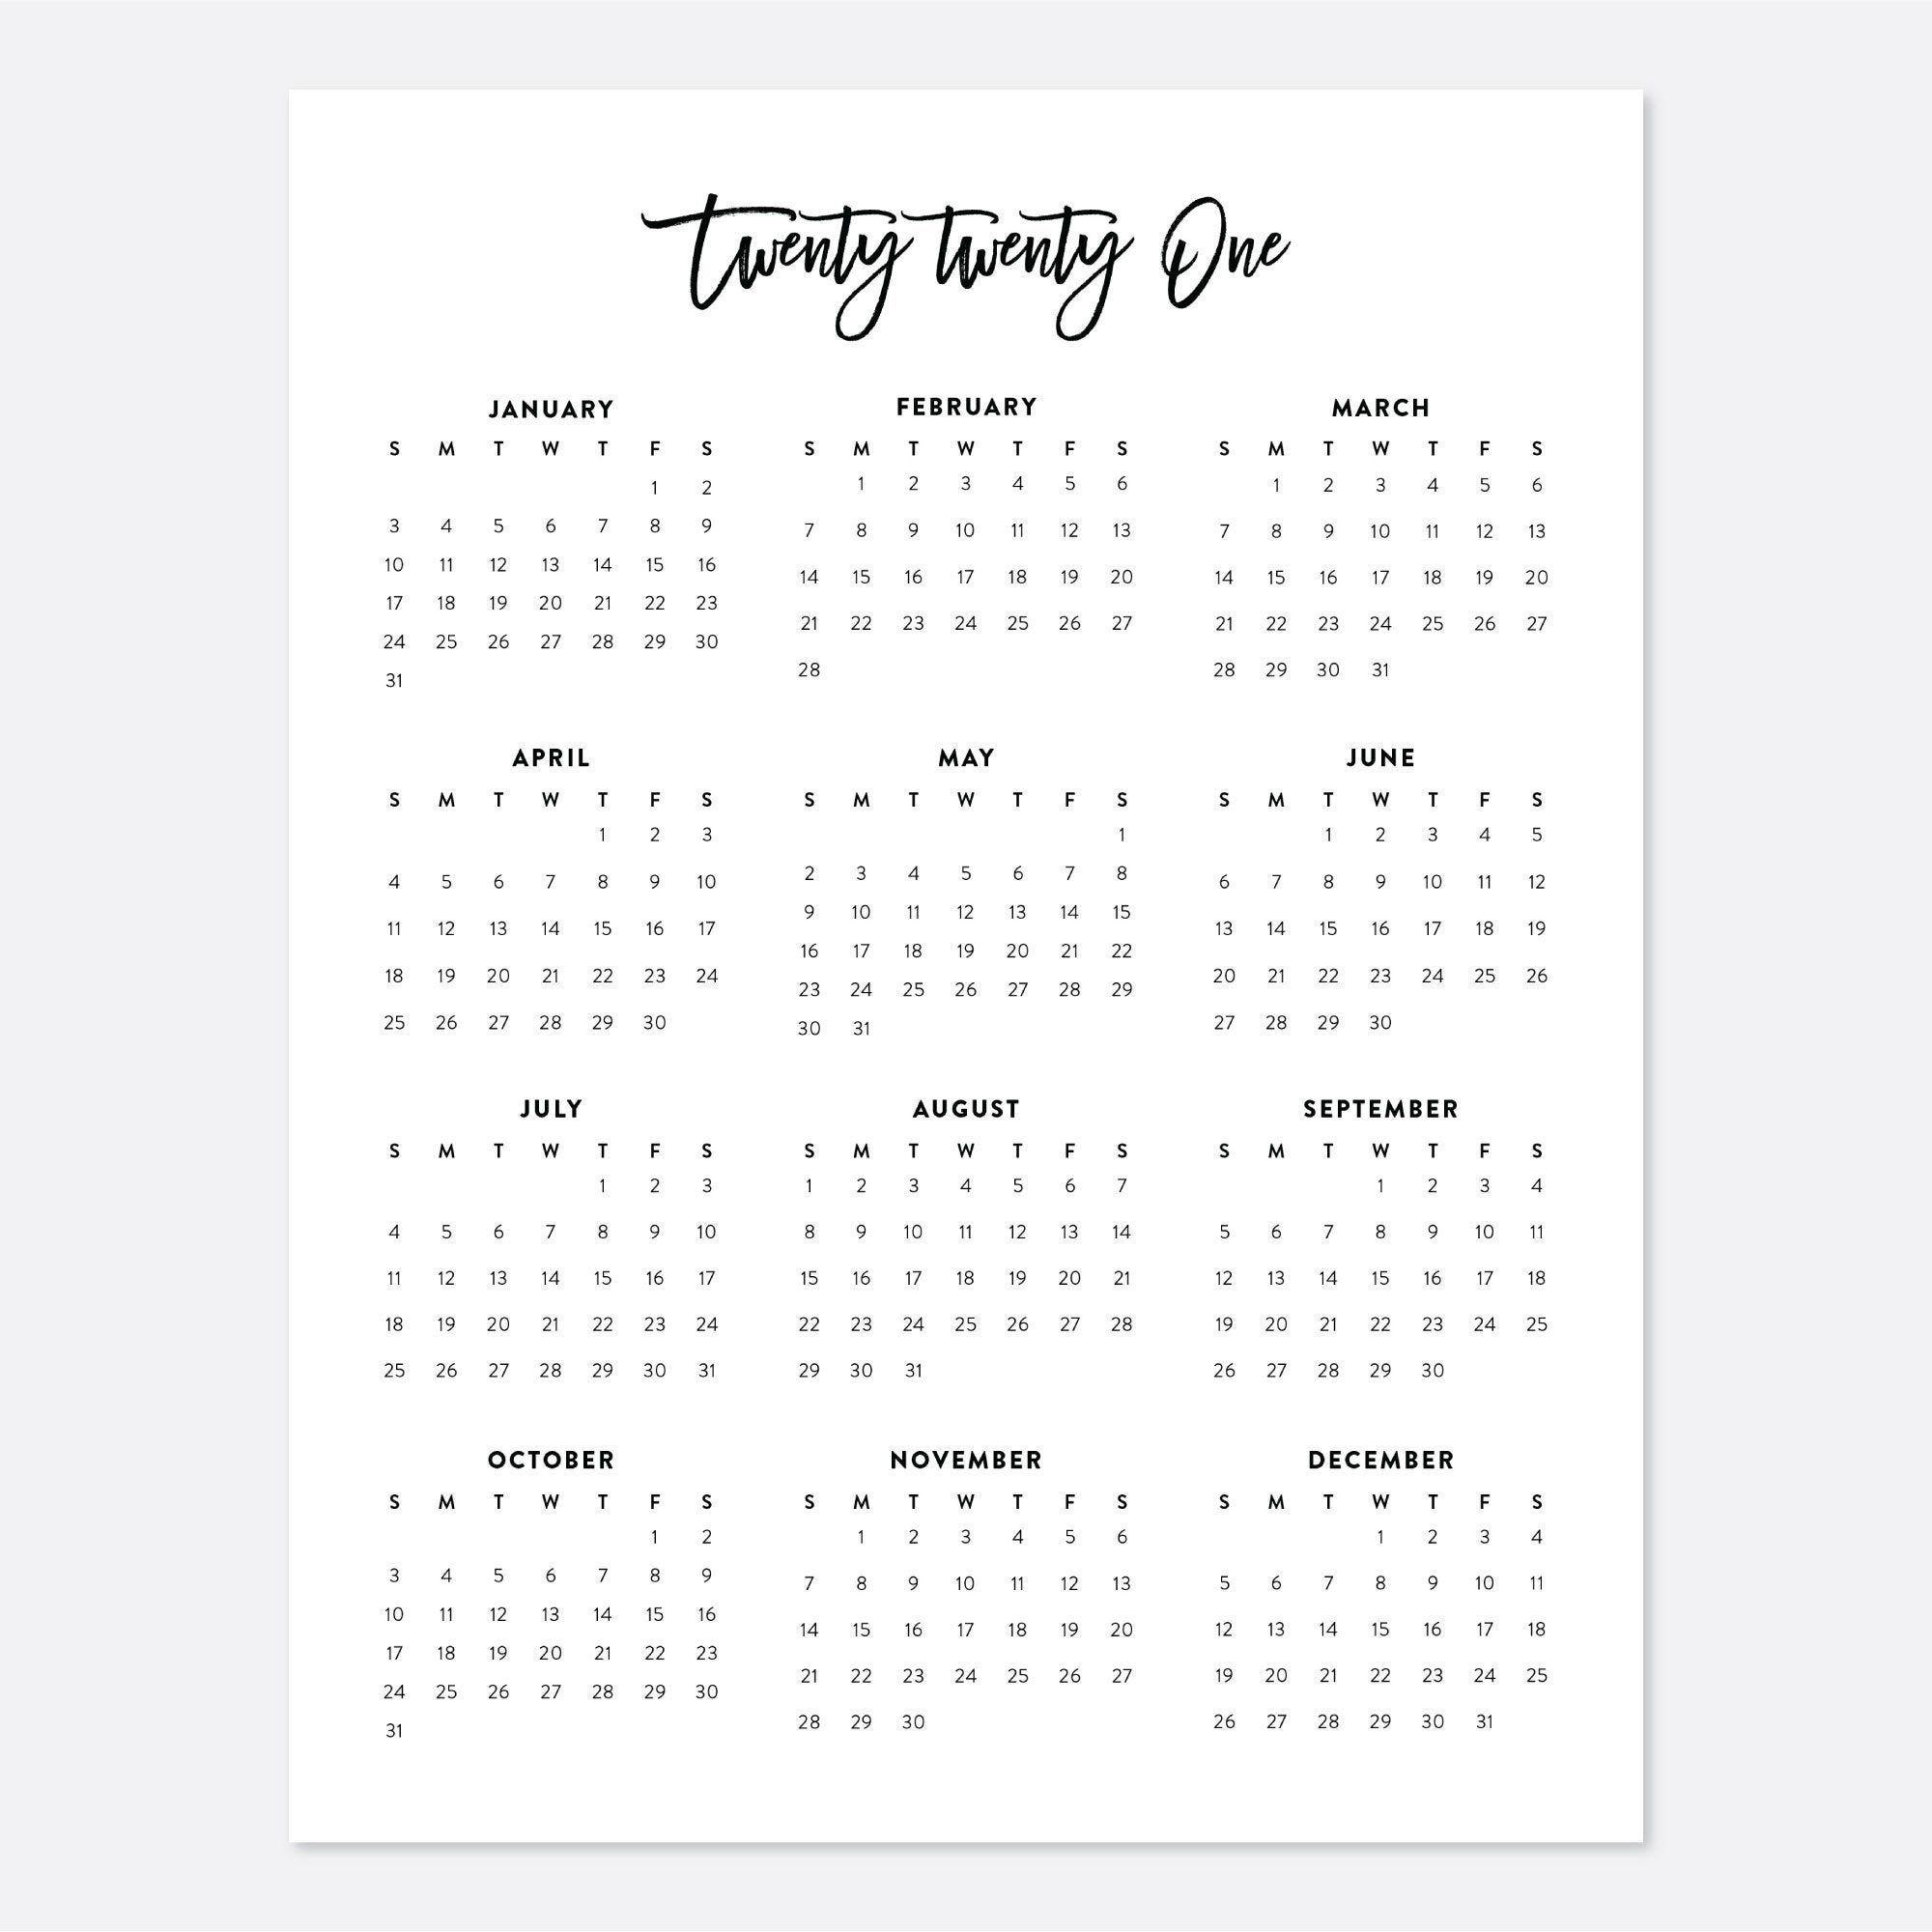 2021 Desk Calendar Printable Calendar 2021 Calendar Year throughout Inspiration Calendar At A Glance